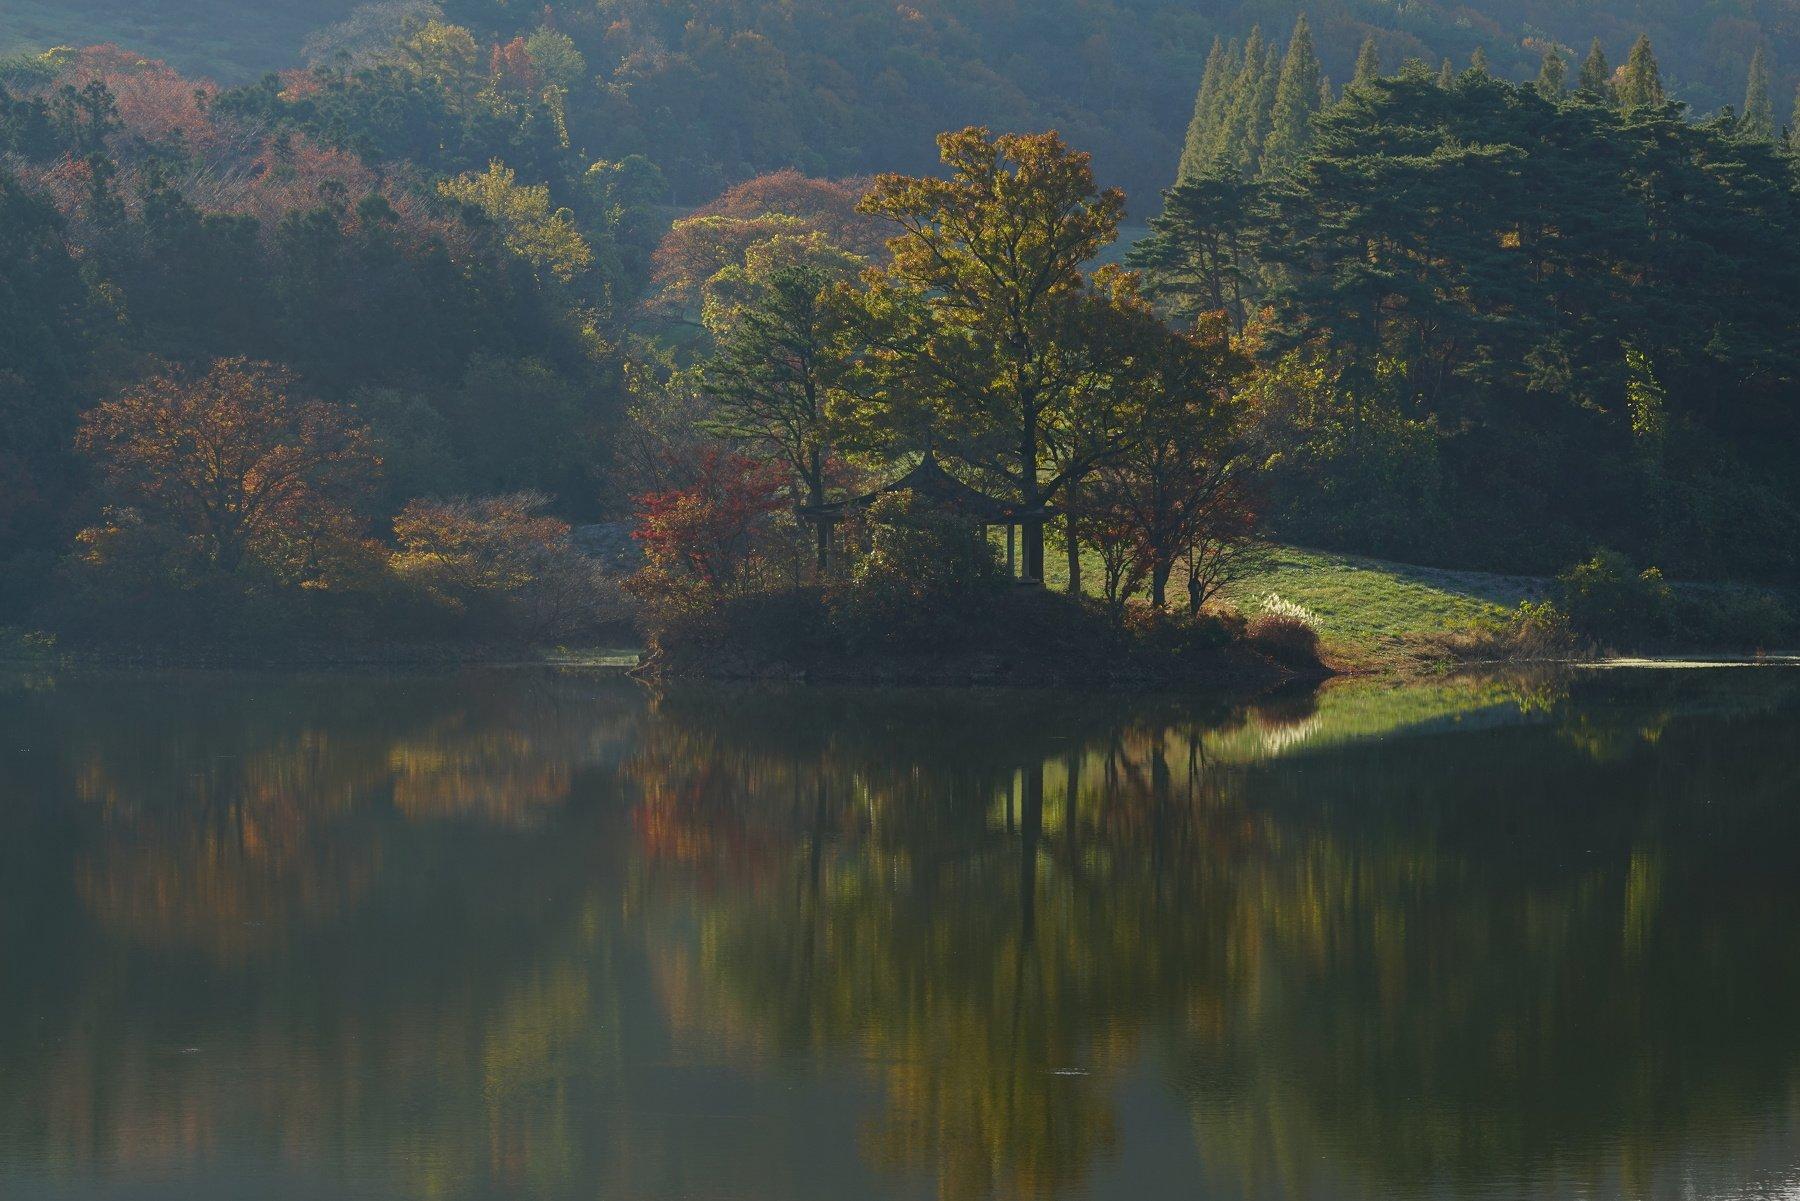 korea,chuncheongnamdo,autumn,morning,reservoir,mountain,backlight,reflection,house, Shin